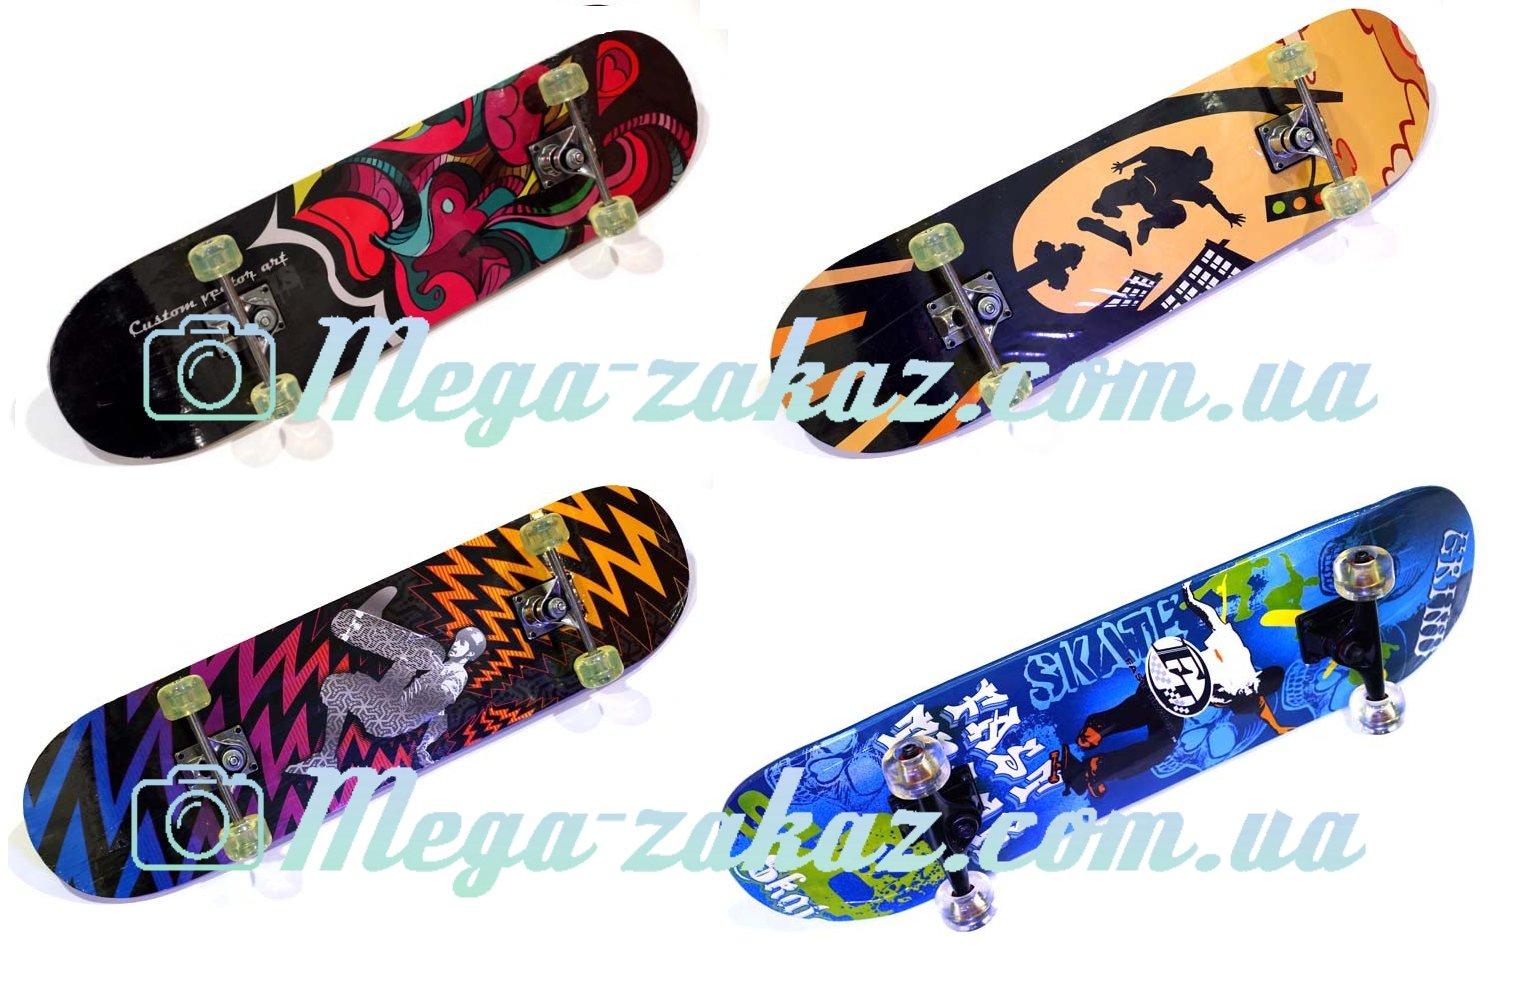 http://mega-zakaz.com.ua/images/upload/скейт%20ms%200321%205ZAKAZ.jpg